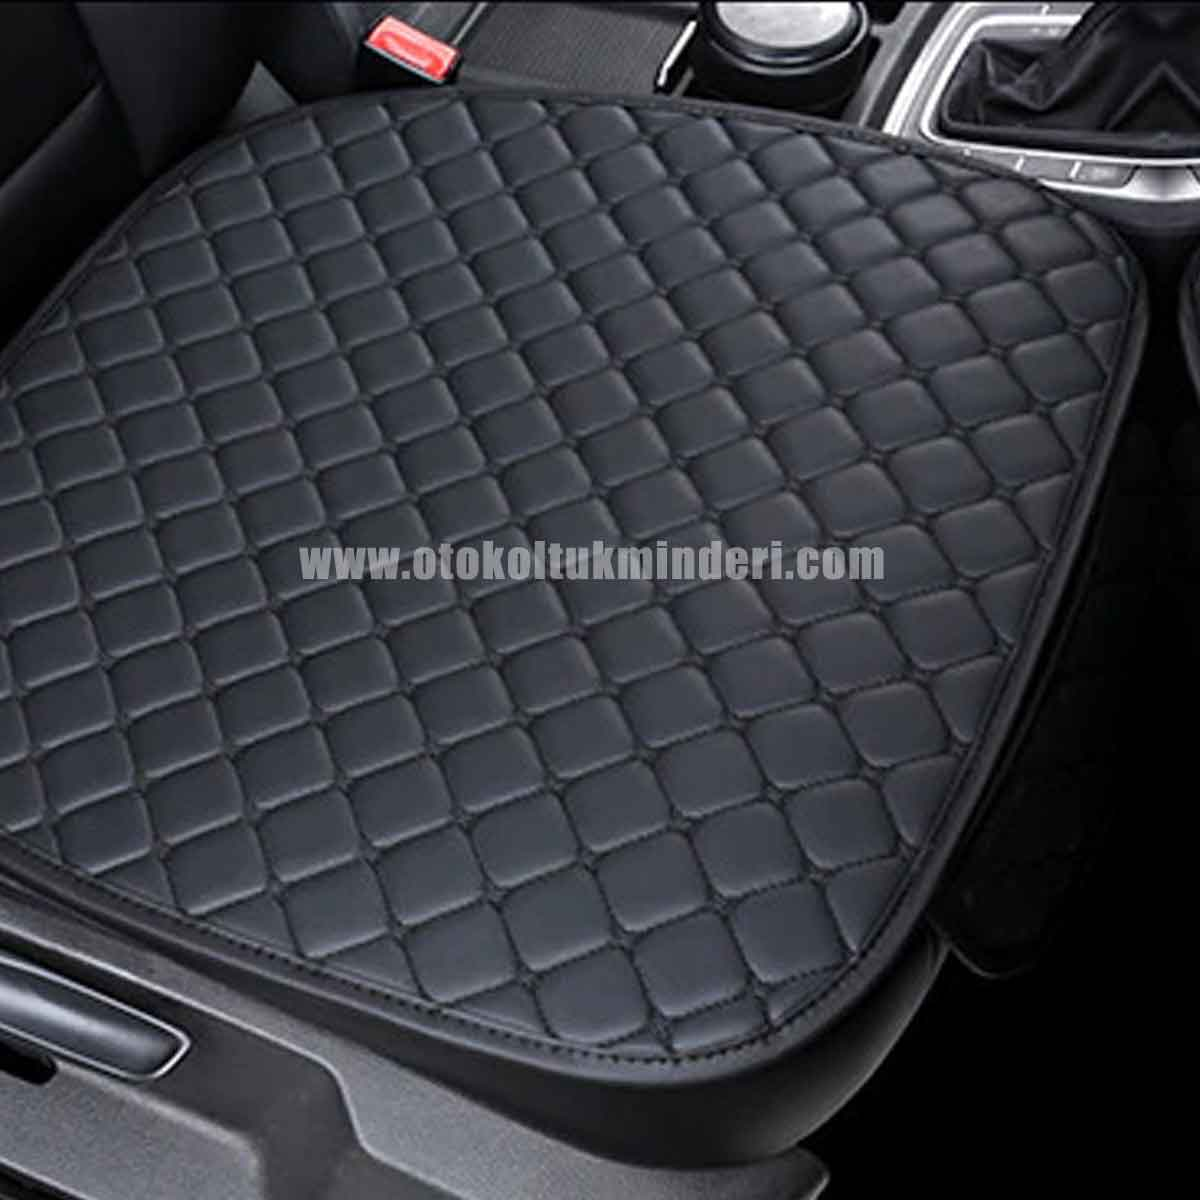 Mazda oto koltuk kılıfı - Mazda Koltuk minderi Siyah Deri Cepli